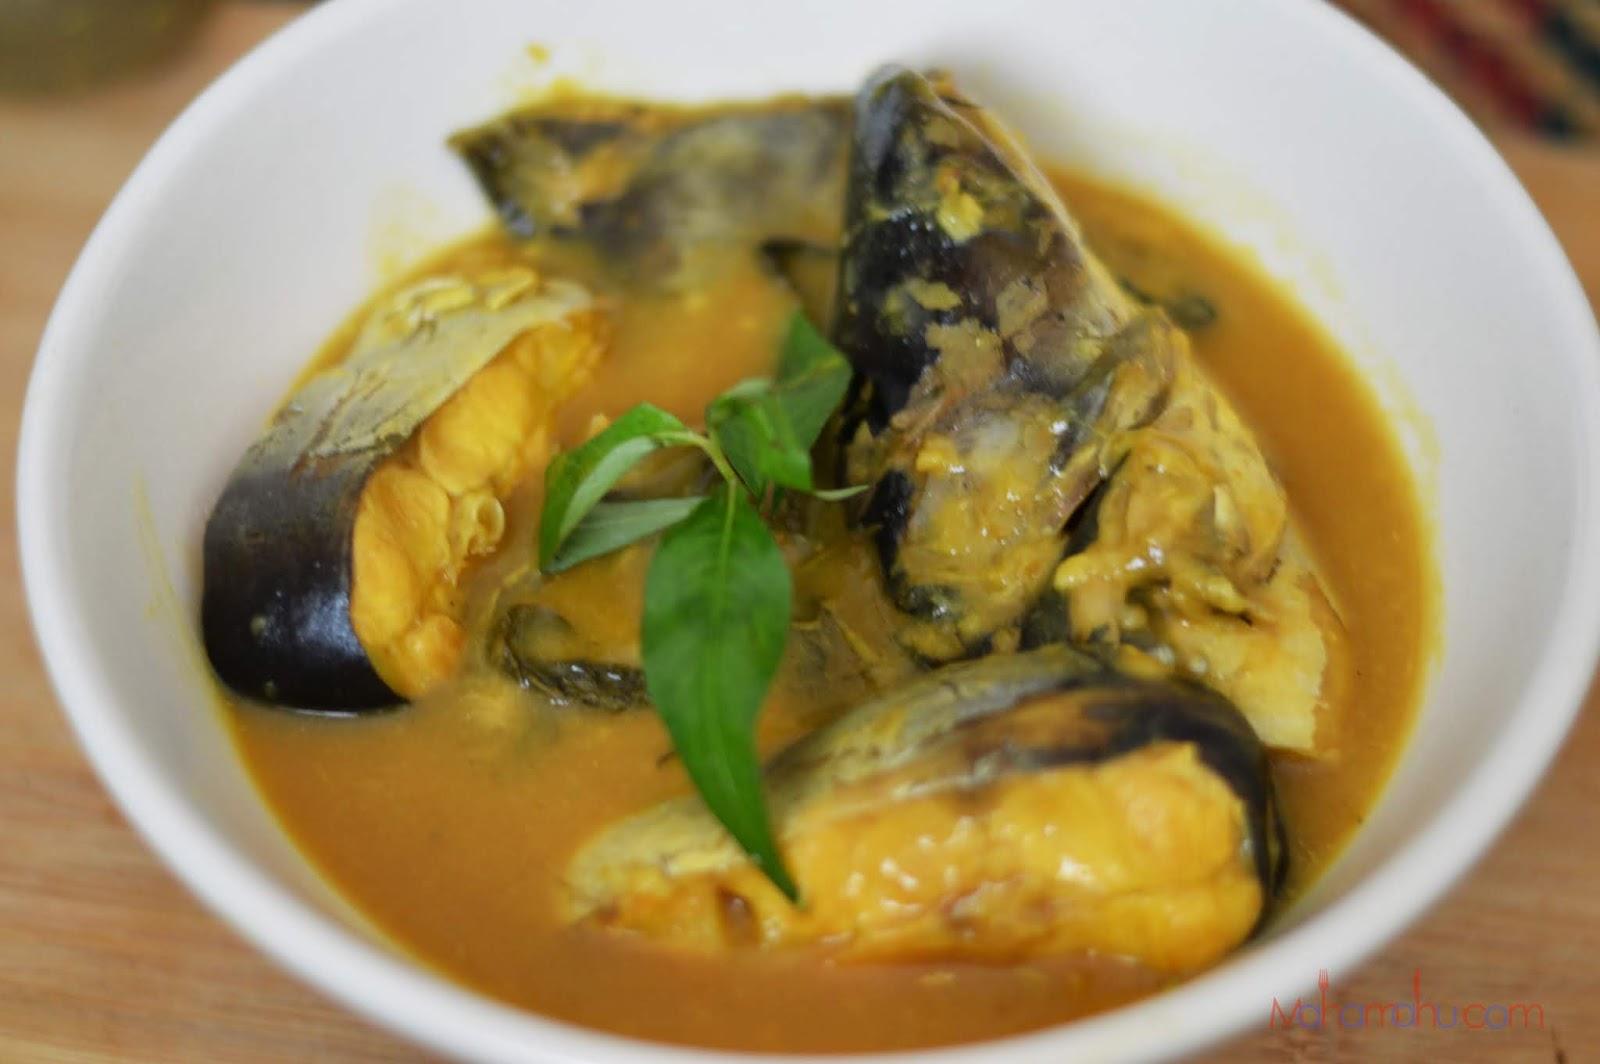 Resepi Tempoyak Ikan Patin - Resepi Ikan Patin Masak Tempoyak Mudah 10 Bahan Resepi Populer